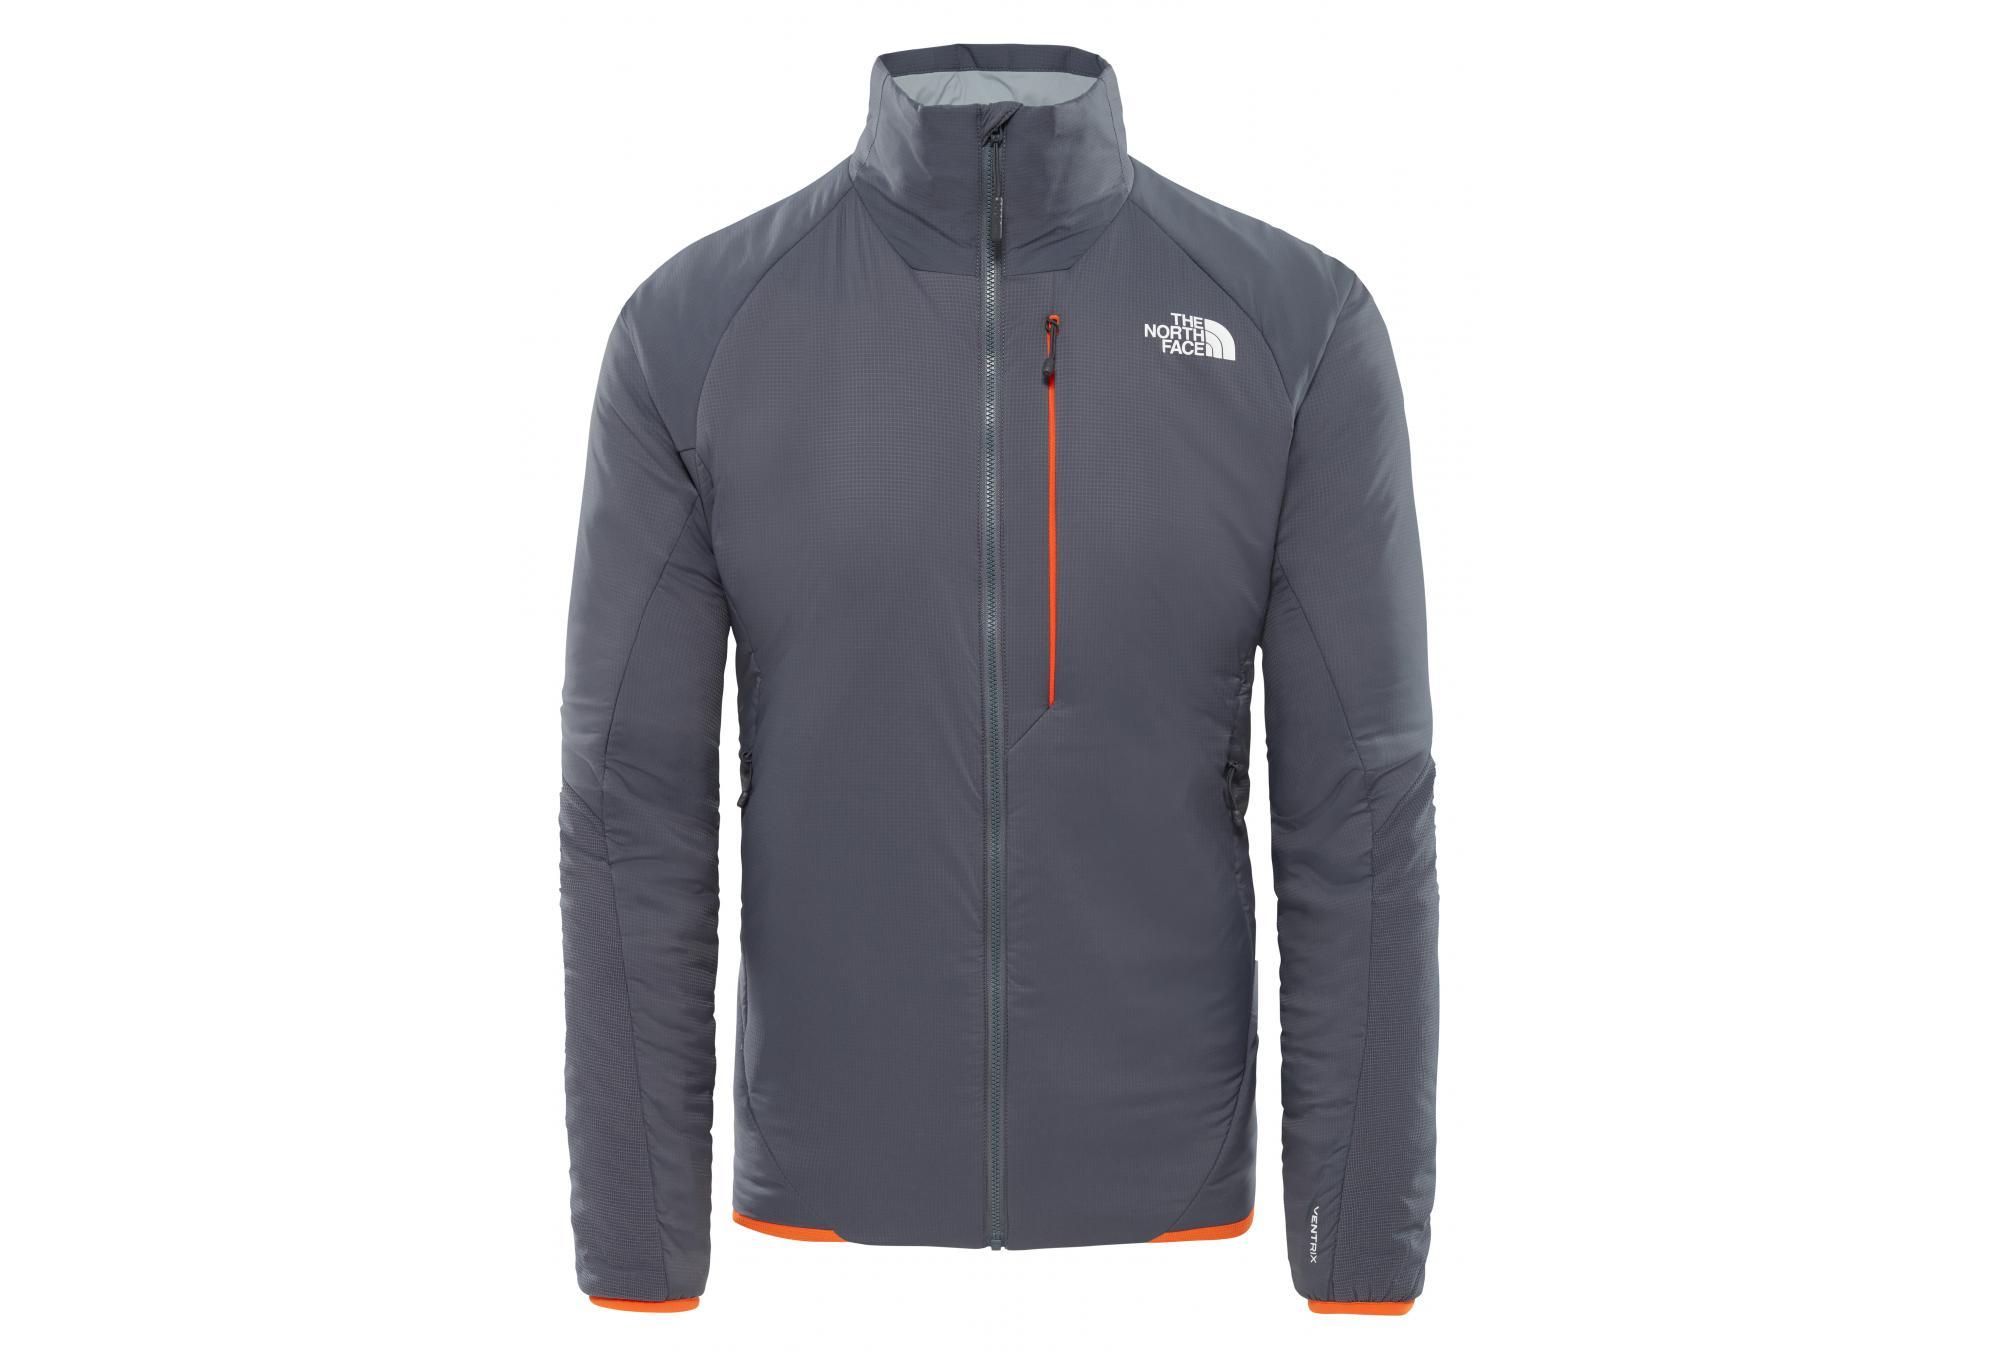 e1251007c0d Coats   Jackets Clothing